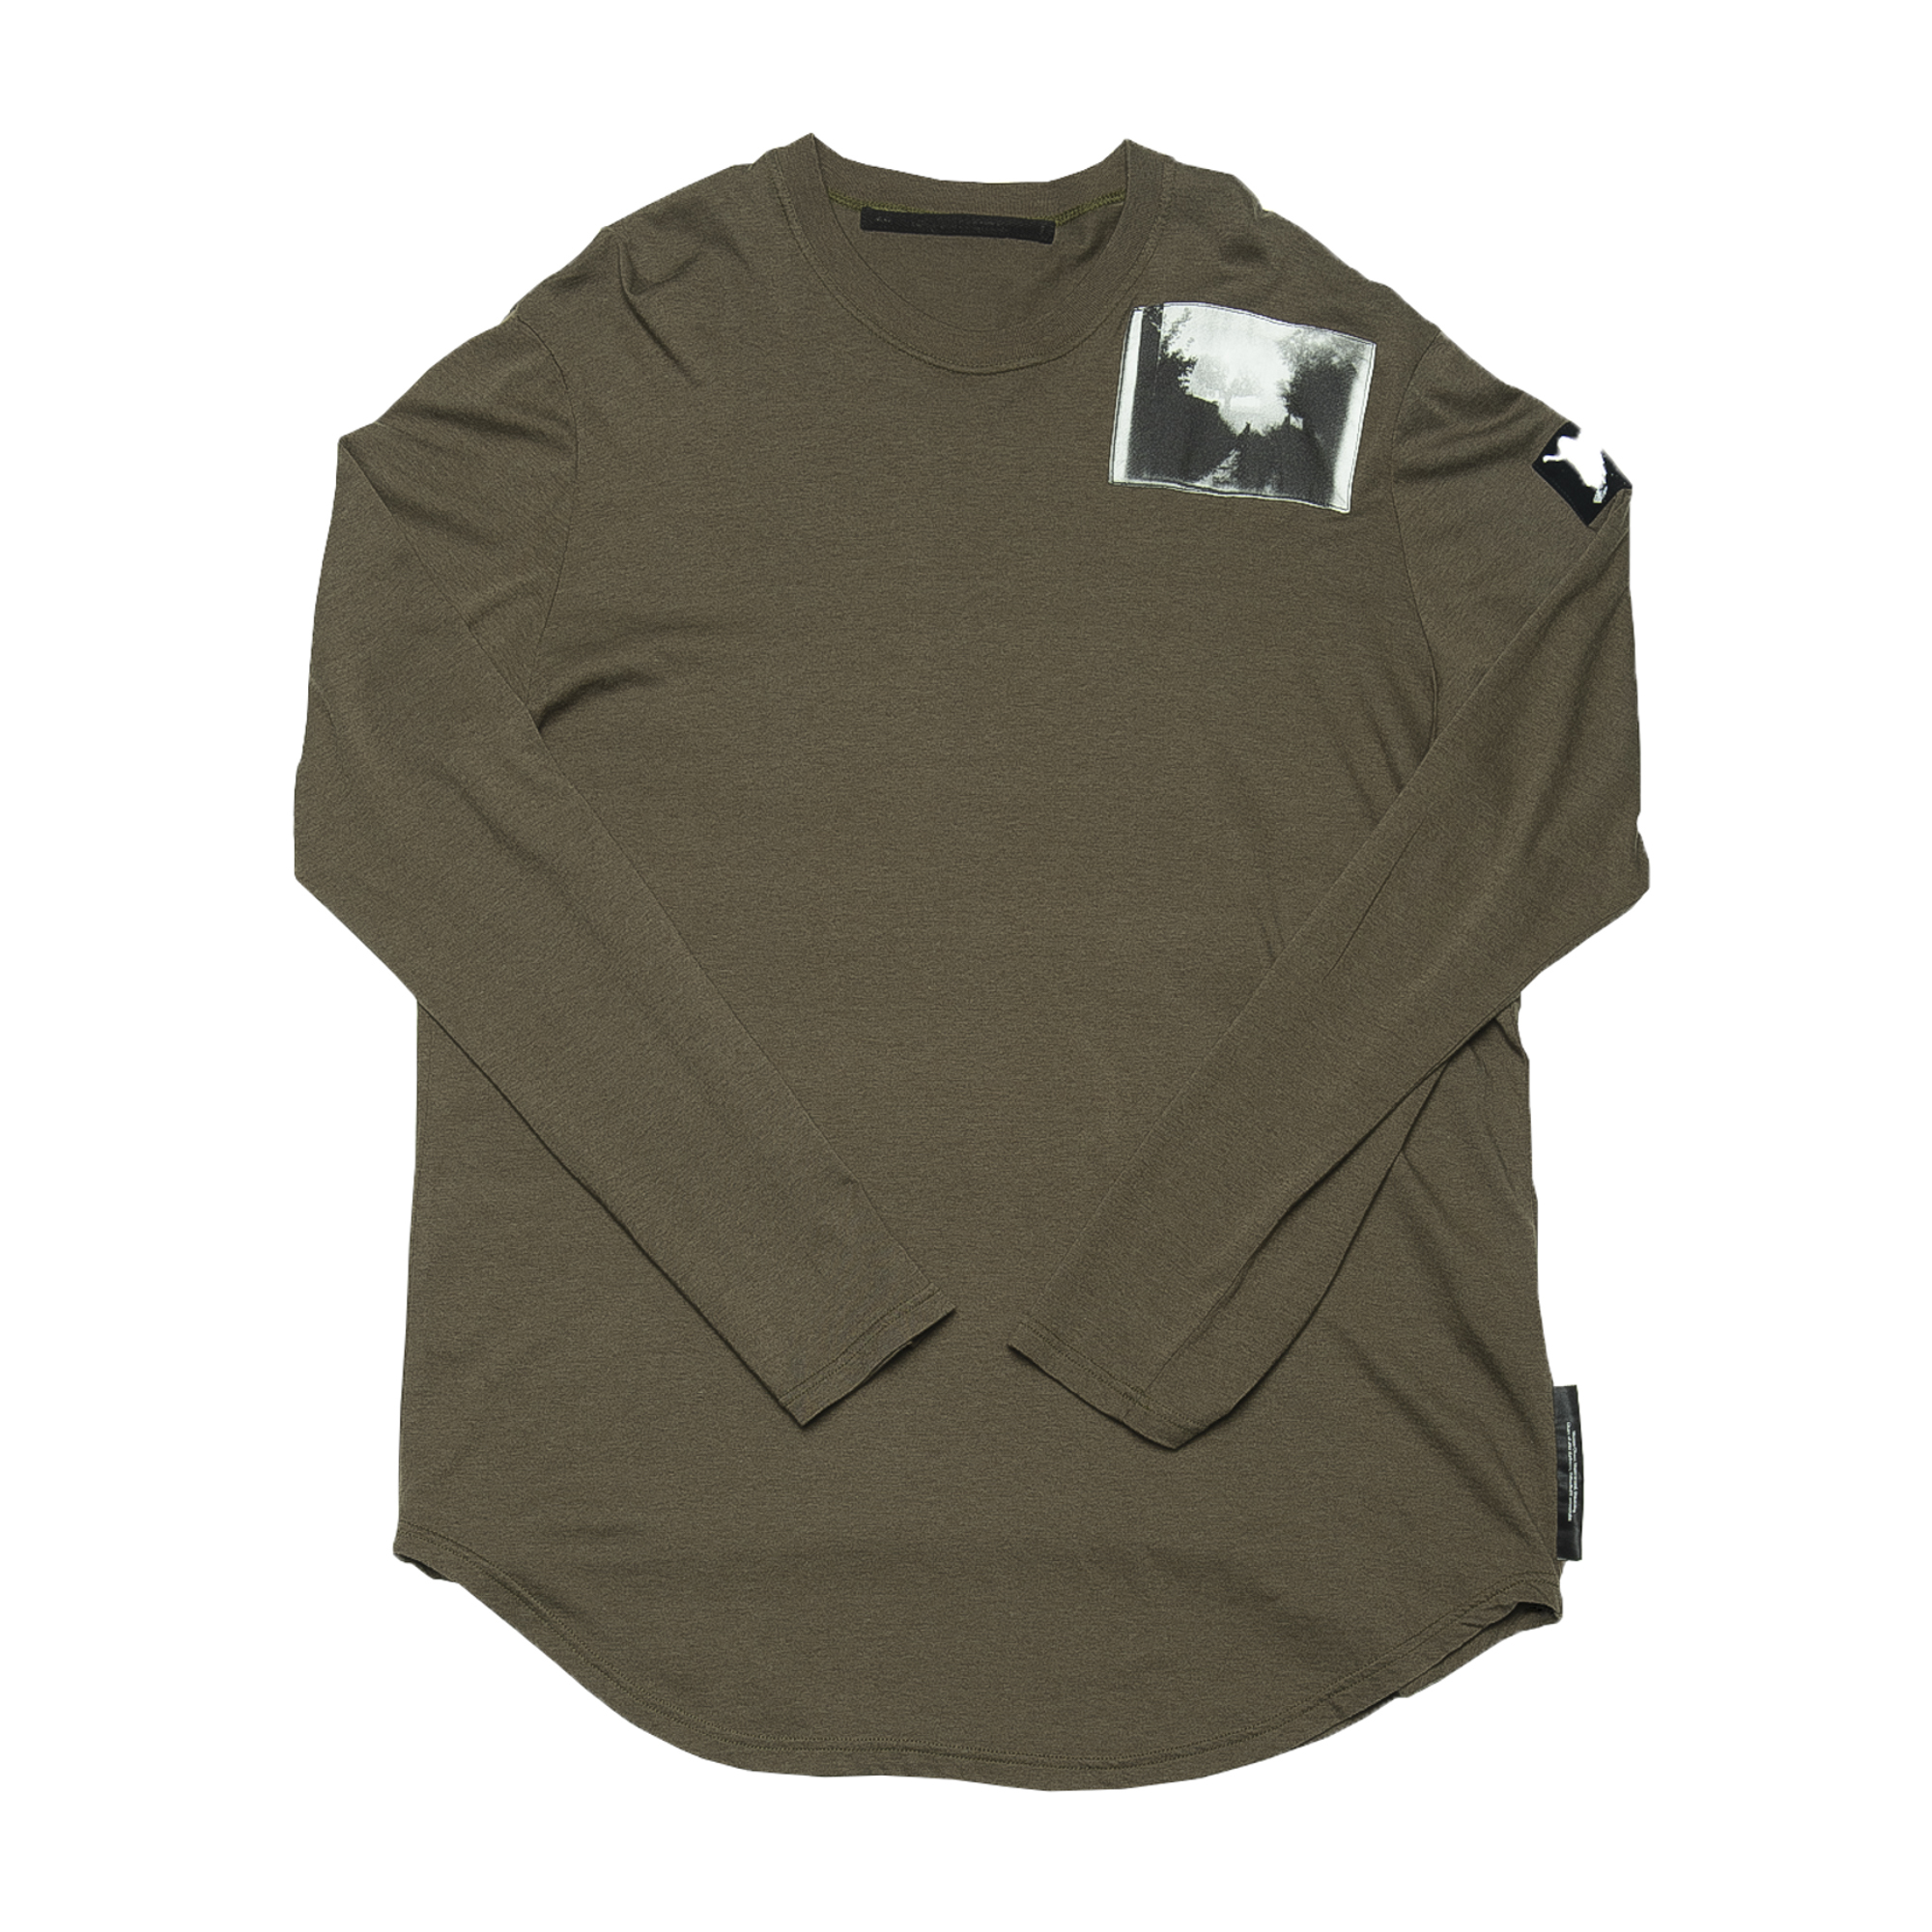 687CPM3-KHAKI / パッチプリントシャツ